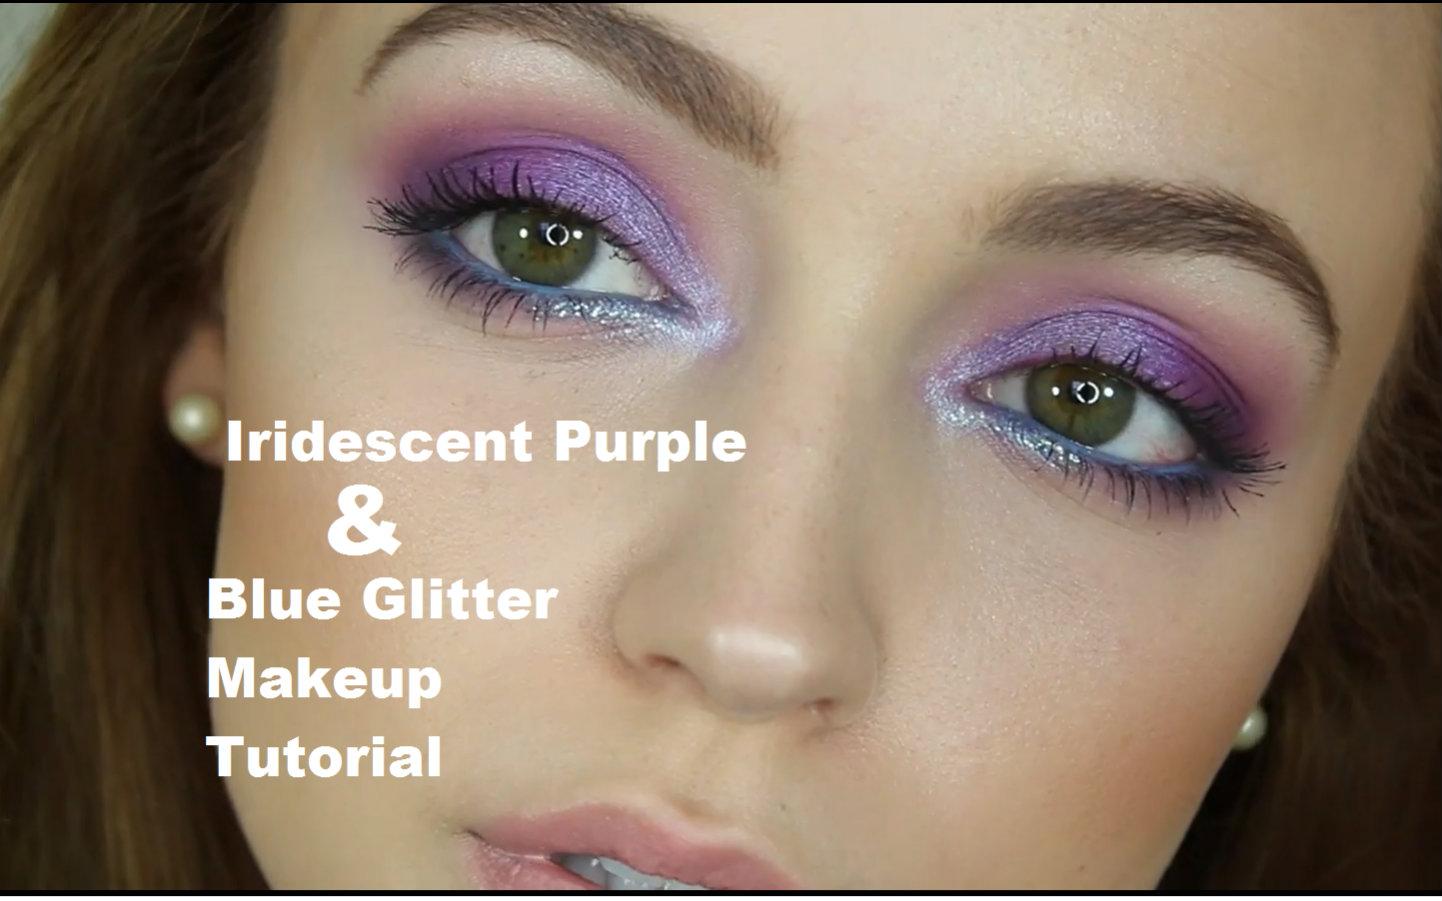 【kathleen lights】渣翻!/ 彩虹蓝紫色眼妆的彩妆教程图片